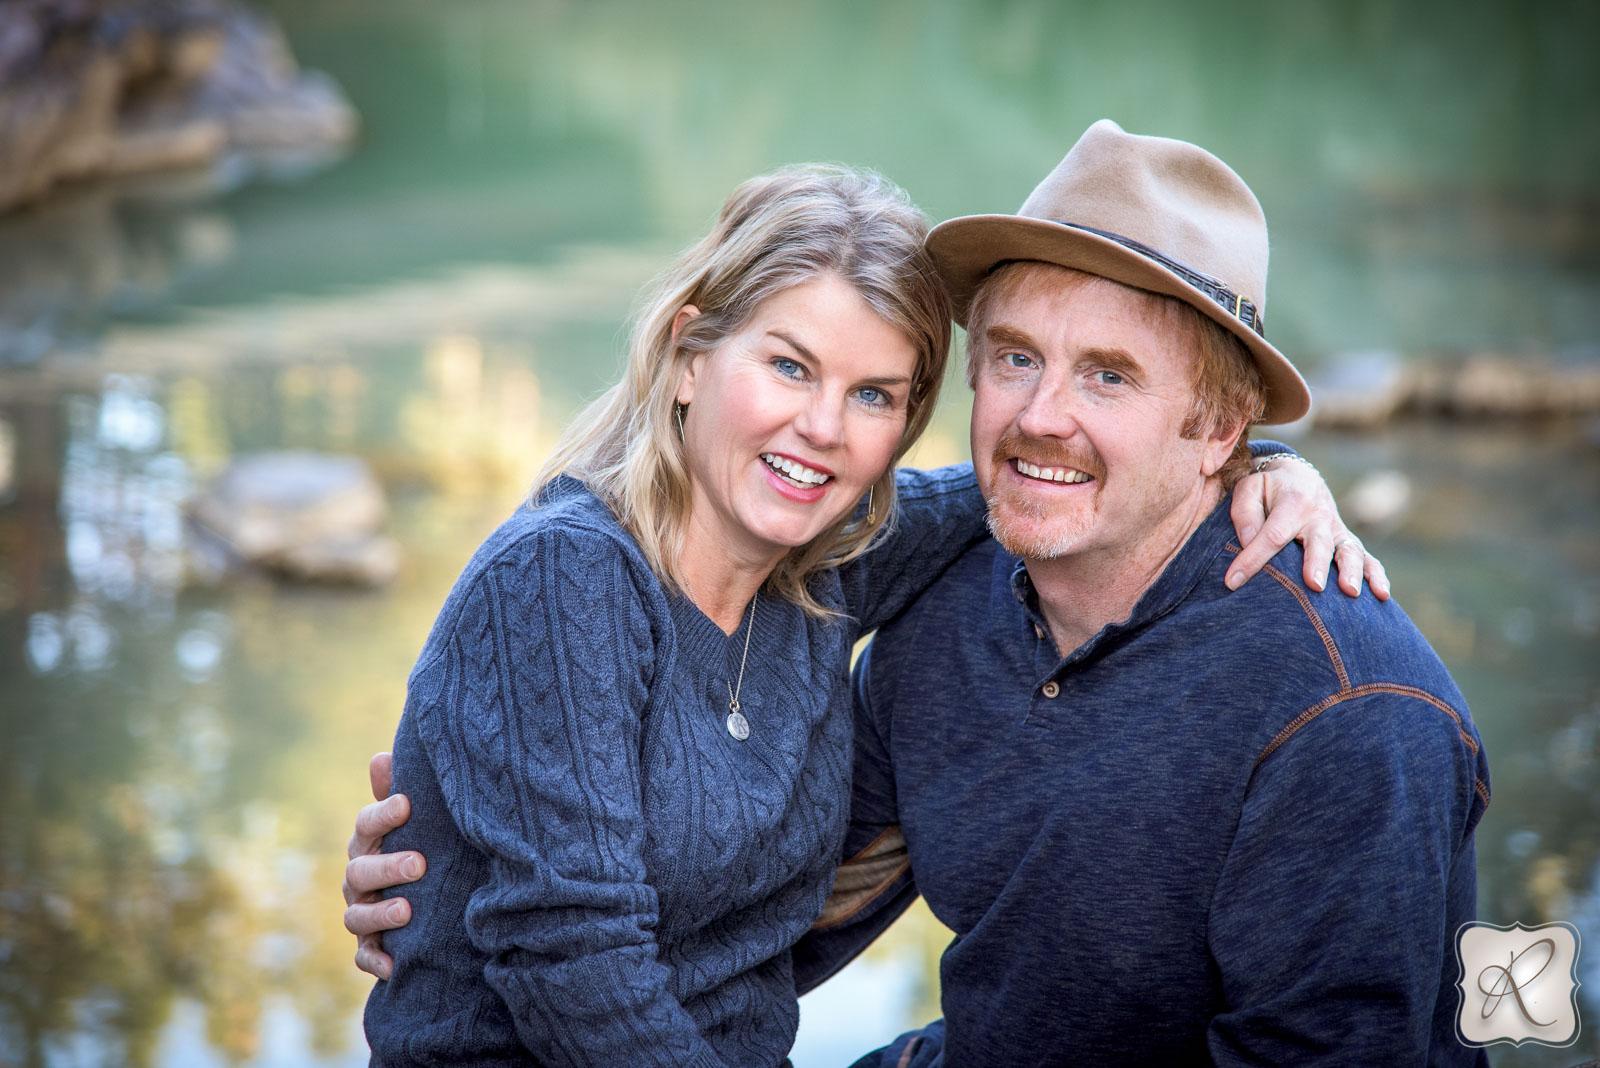 outdoor fall professional portraits in Durango Colorado